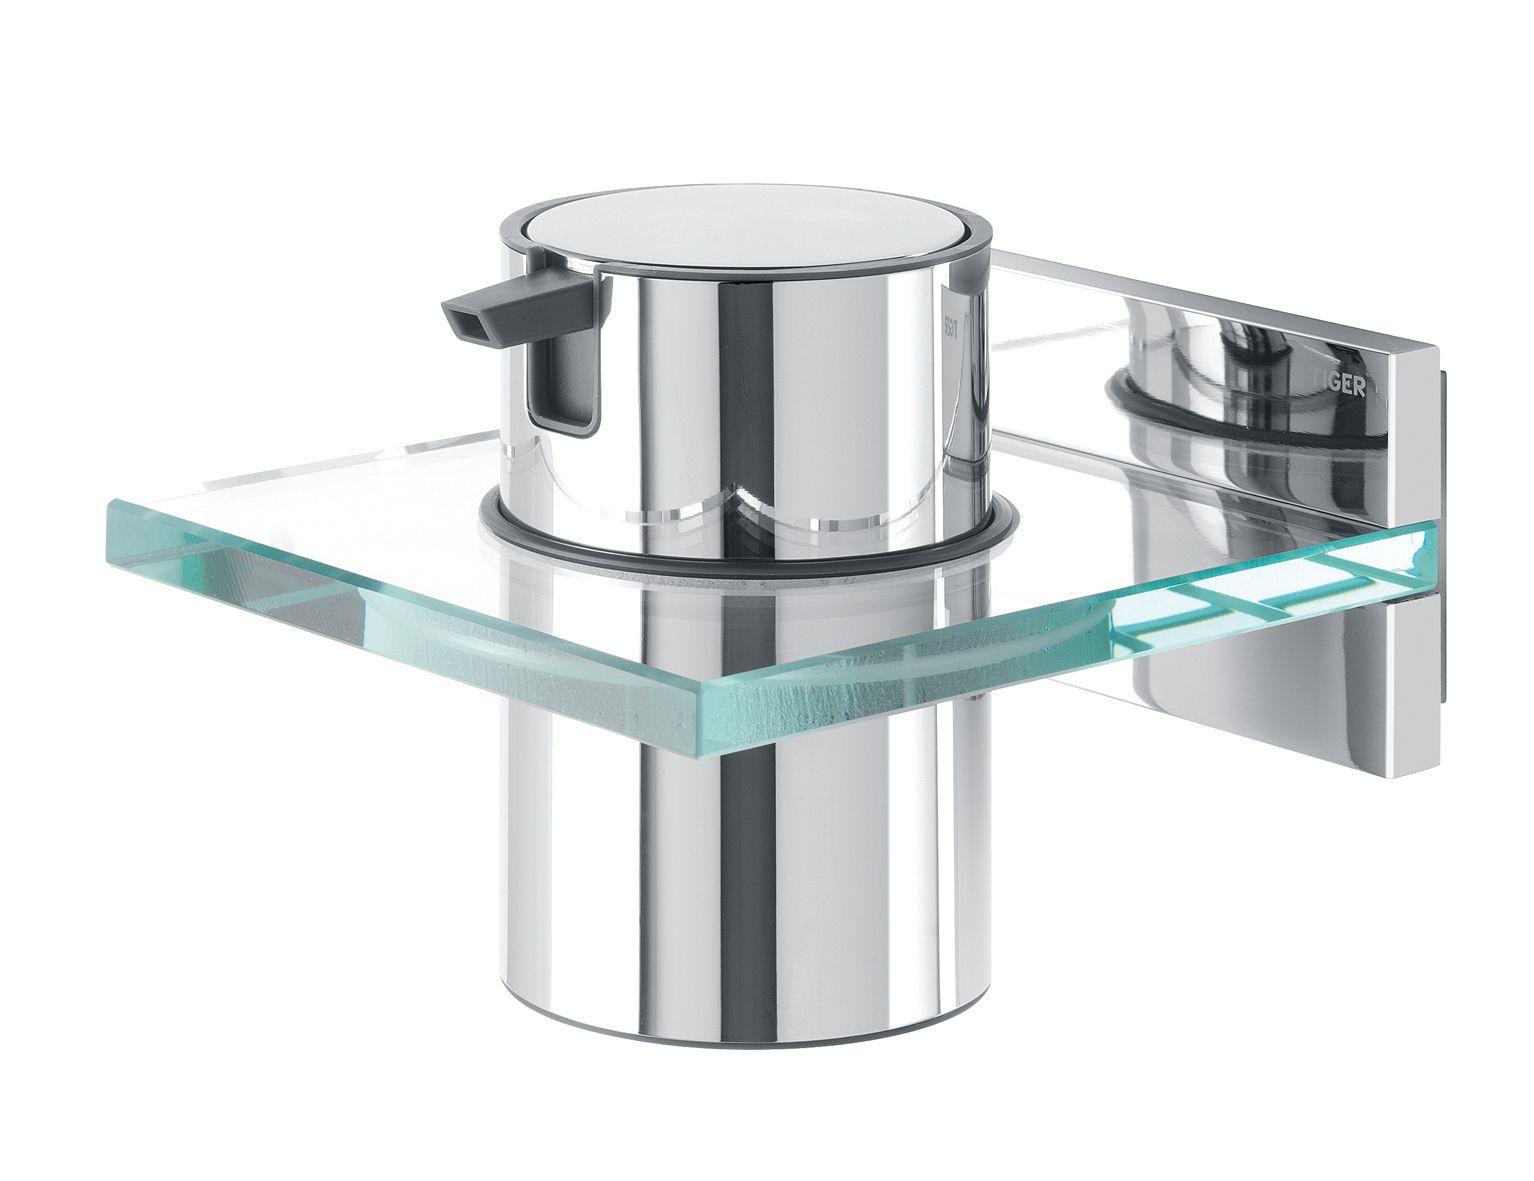 Tiger Saifra zeepdispenser chroom/glas